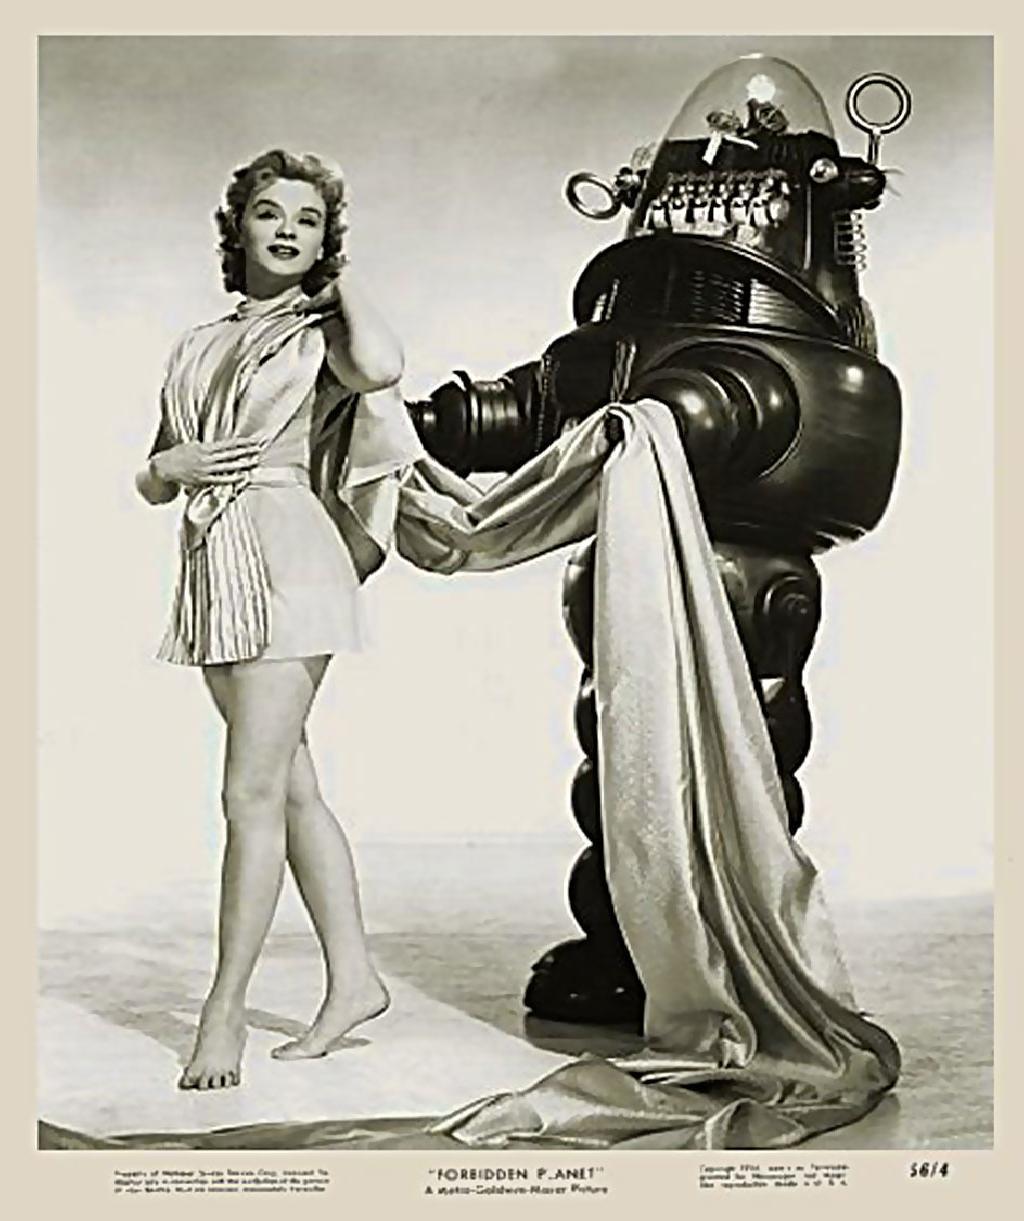 1956 - Forbidden Planet